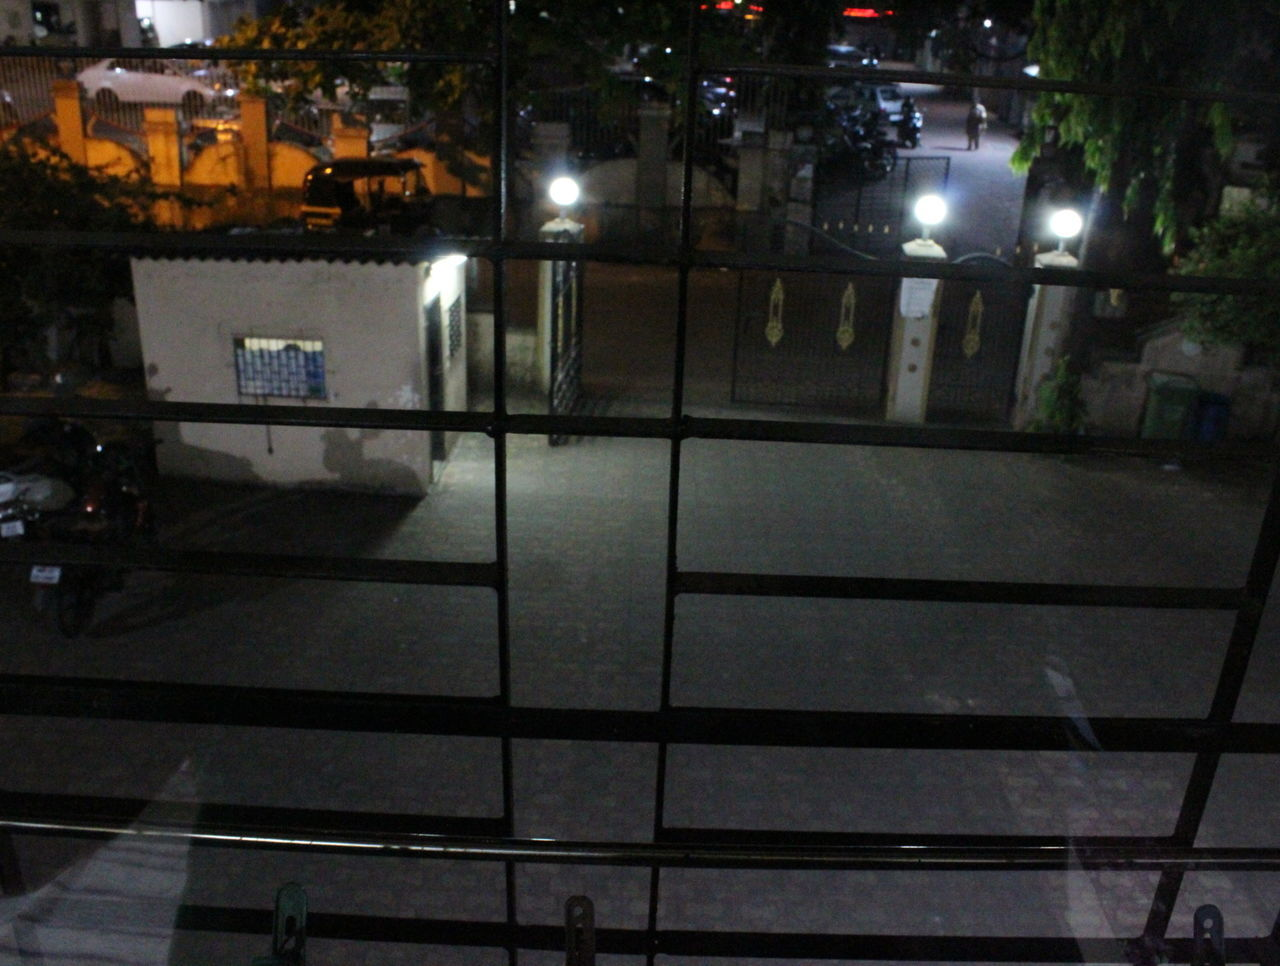 illuminated, night, lighting equipment, street light, architecture, building exterior, built structure, no people, indoors, city, film industry